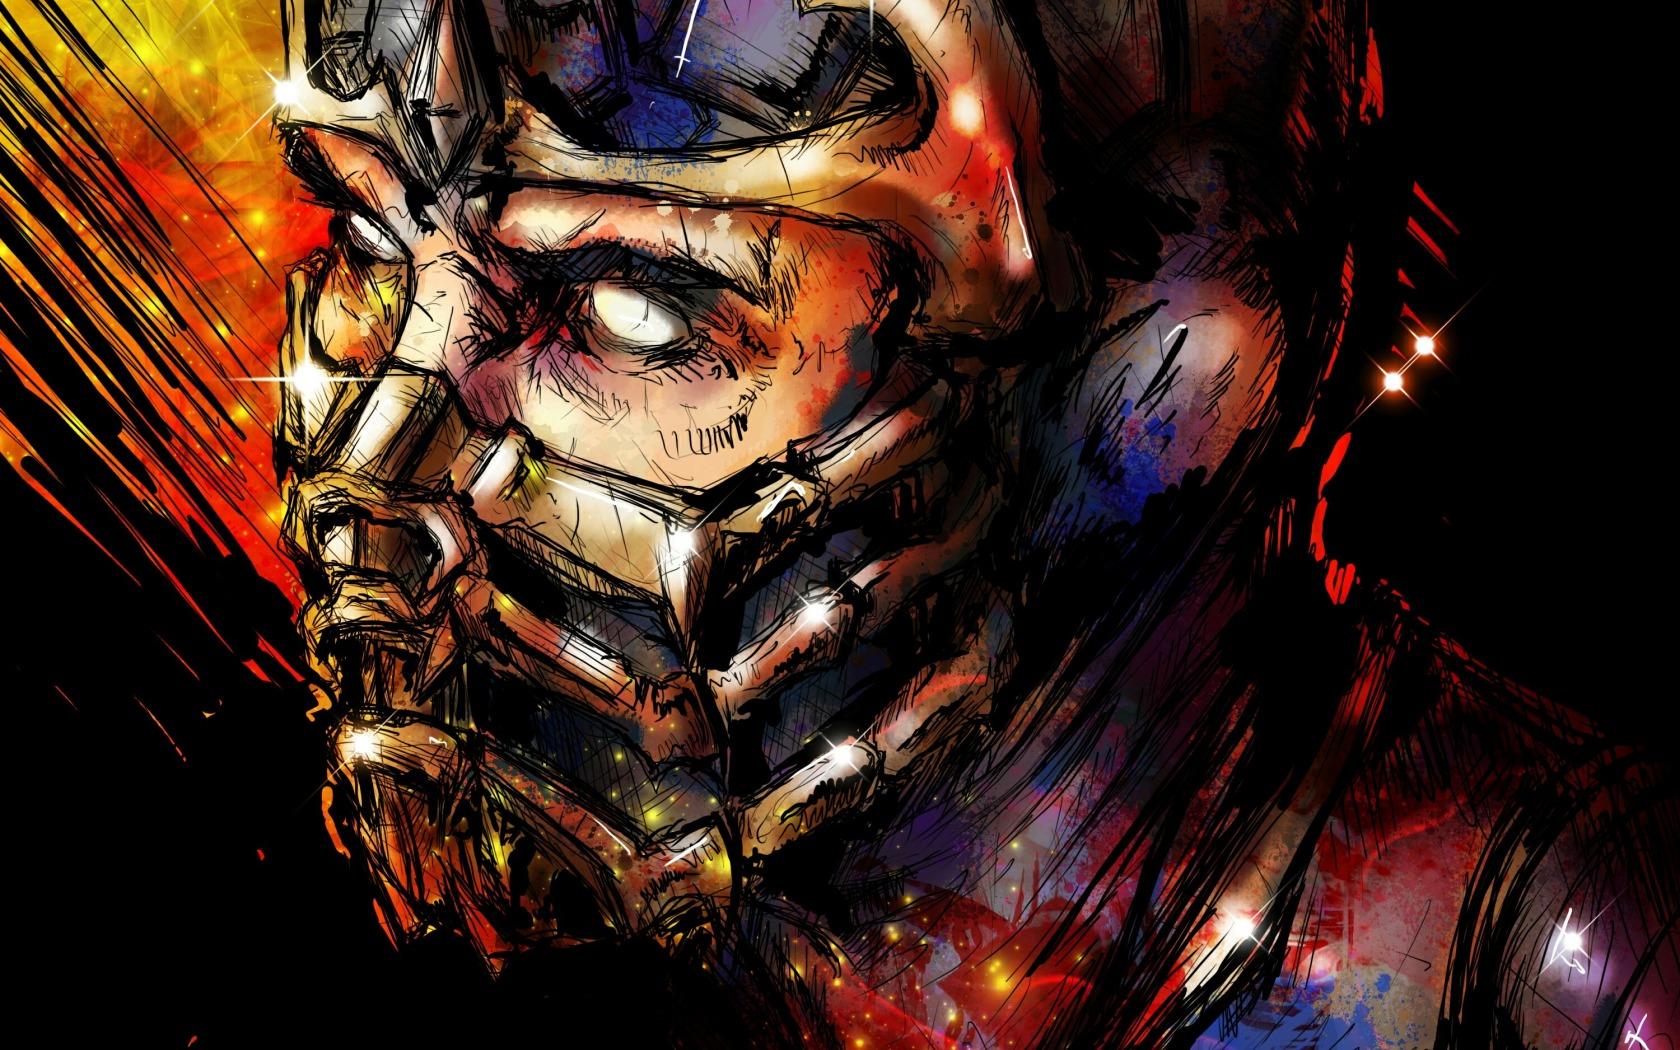 Wallpaper Mortal Kombat Scorpion Art Face Mask 1680x1050